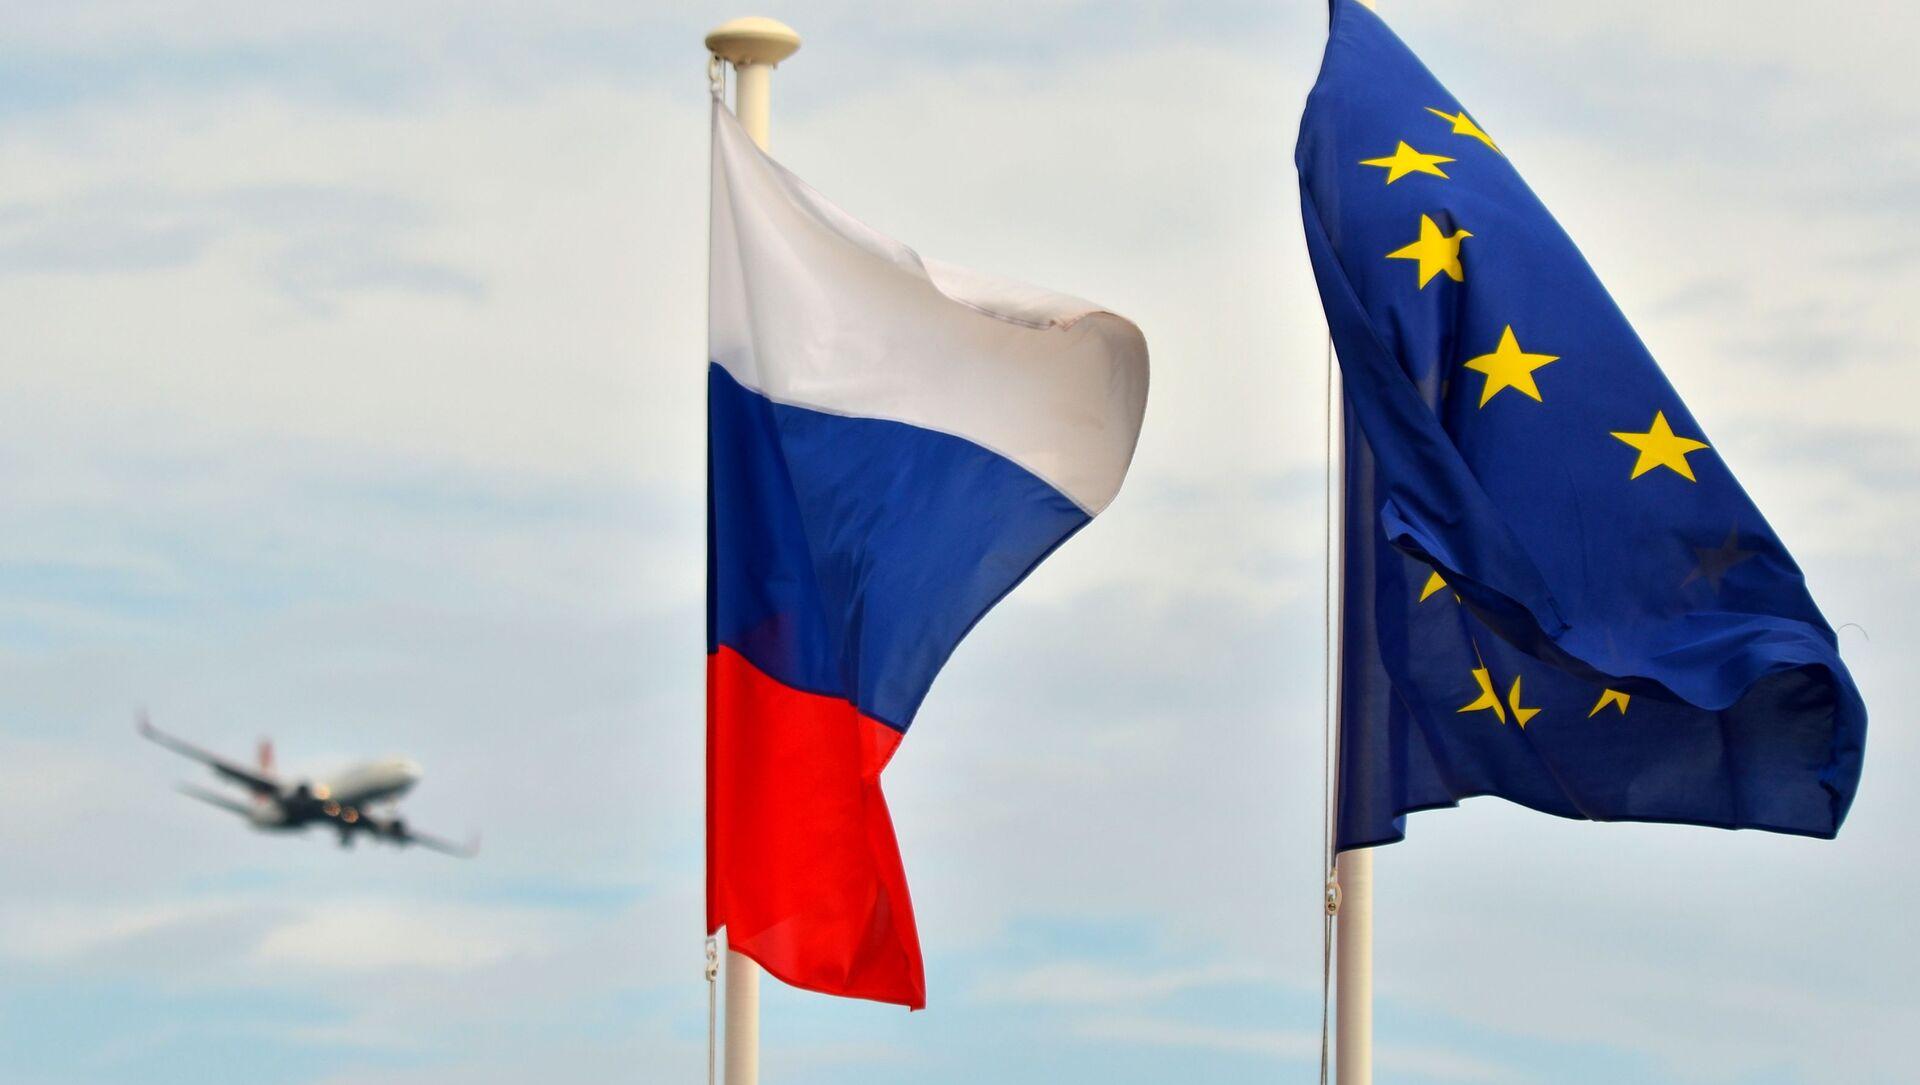 Flagi Rosji i UE w Nicei - Sputnik Polska, 1920, 25.05.2021